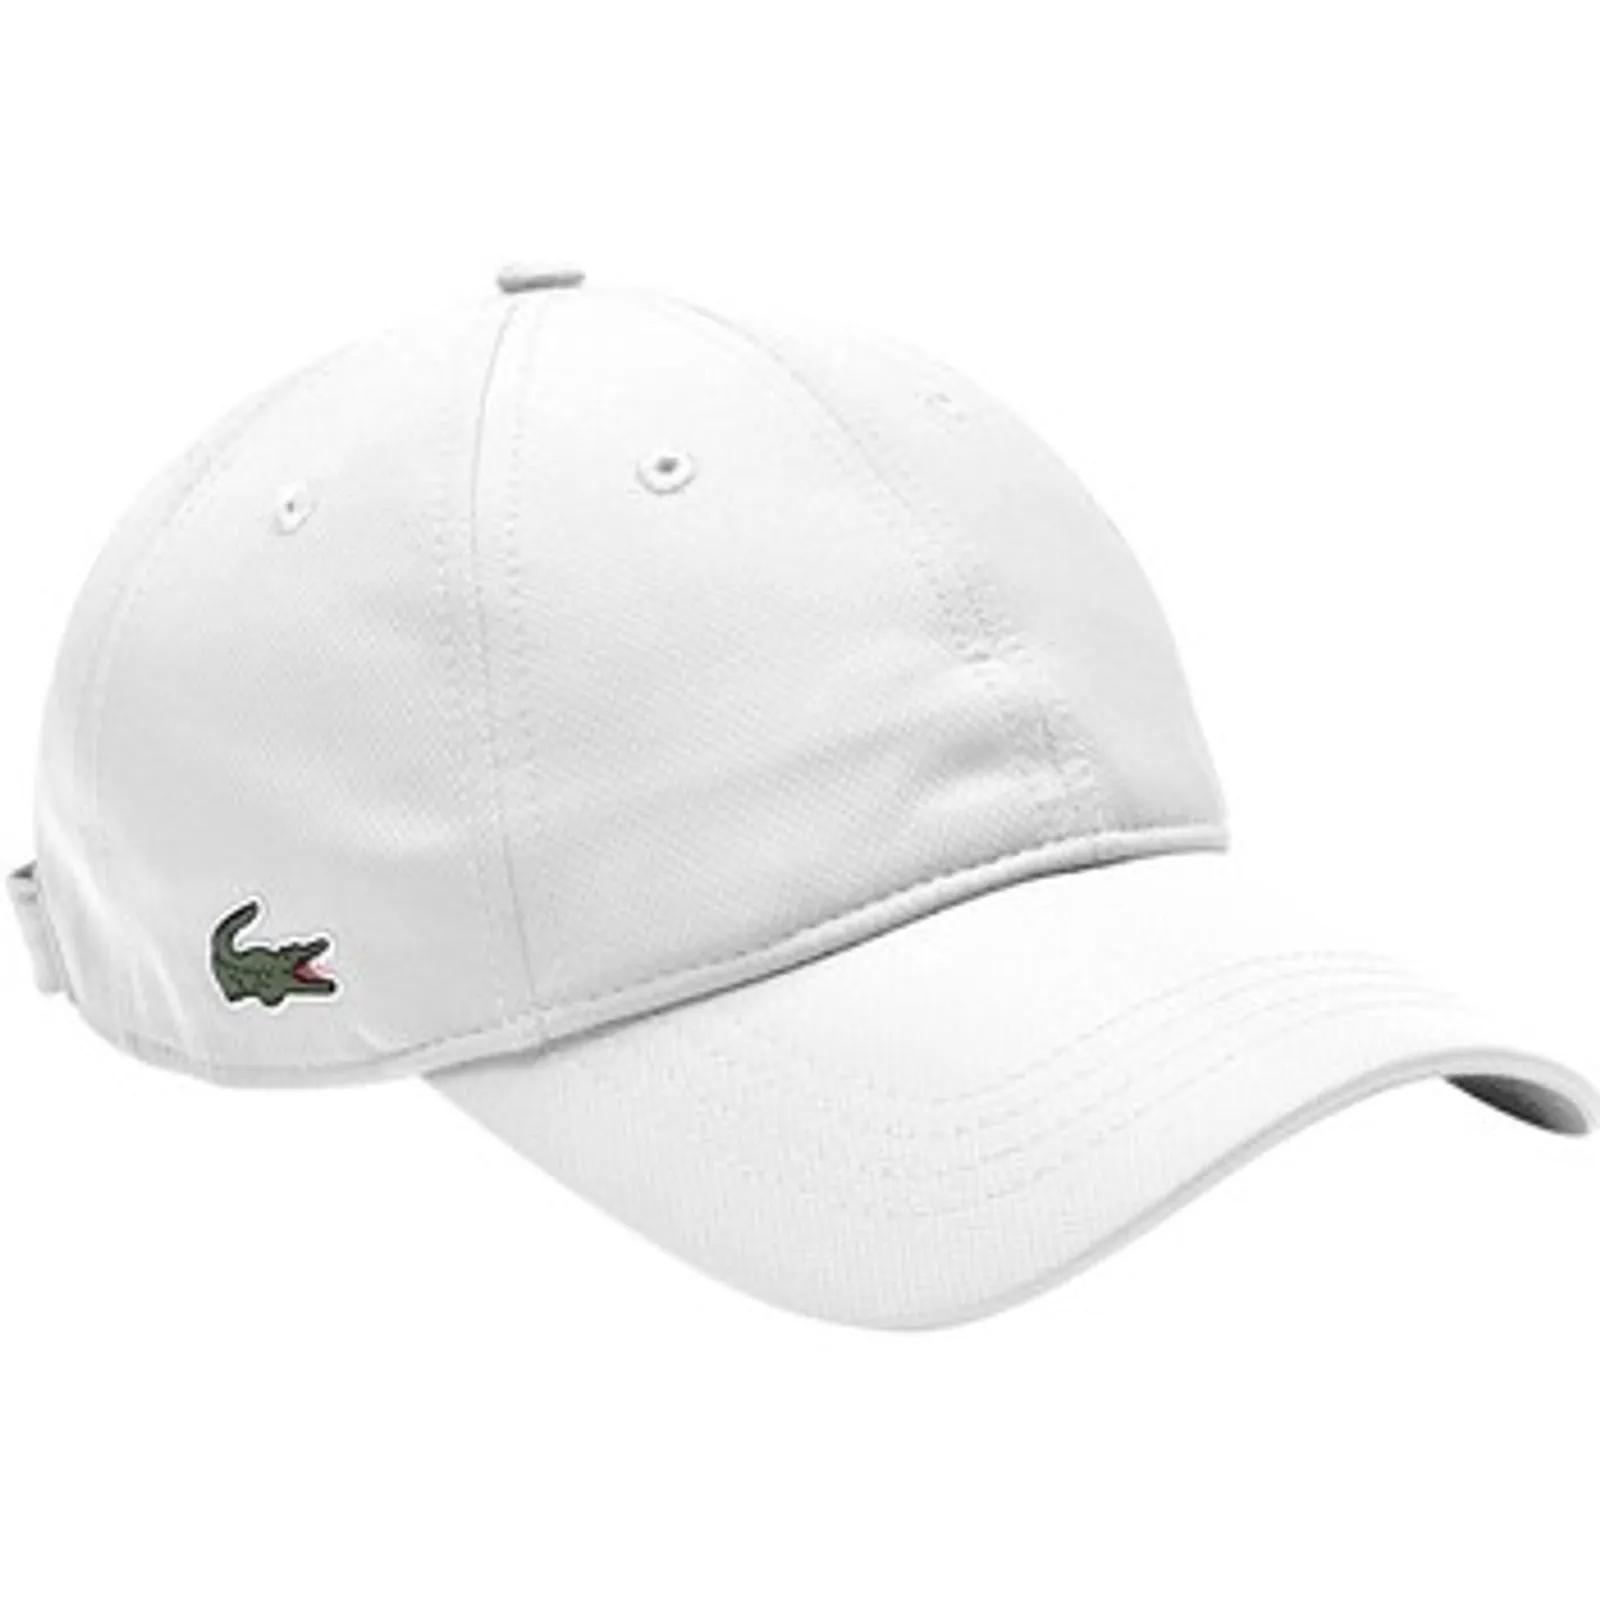 Boné Lacoste RK2662 Branco Logo Lateral